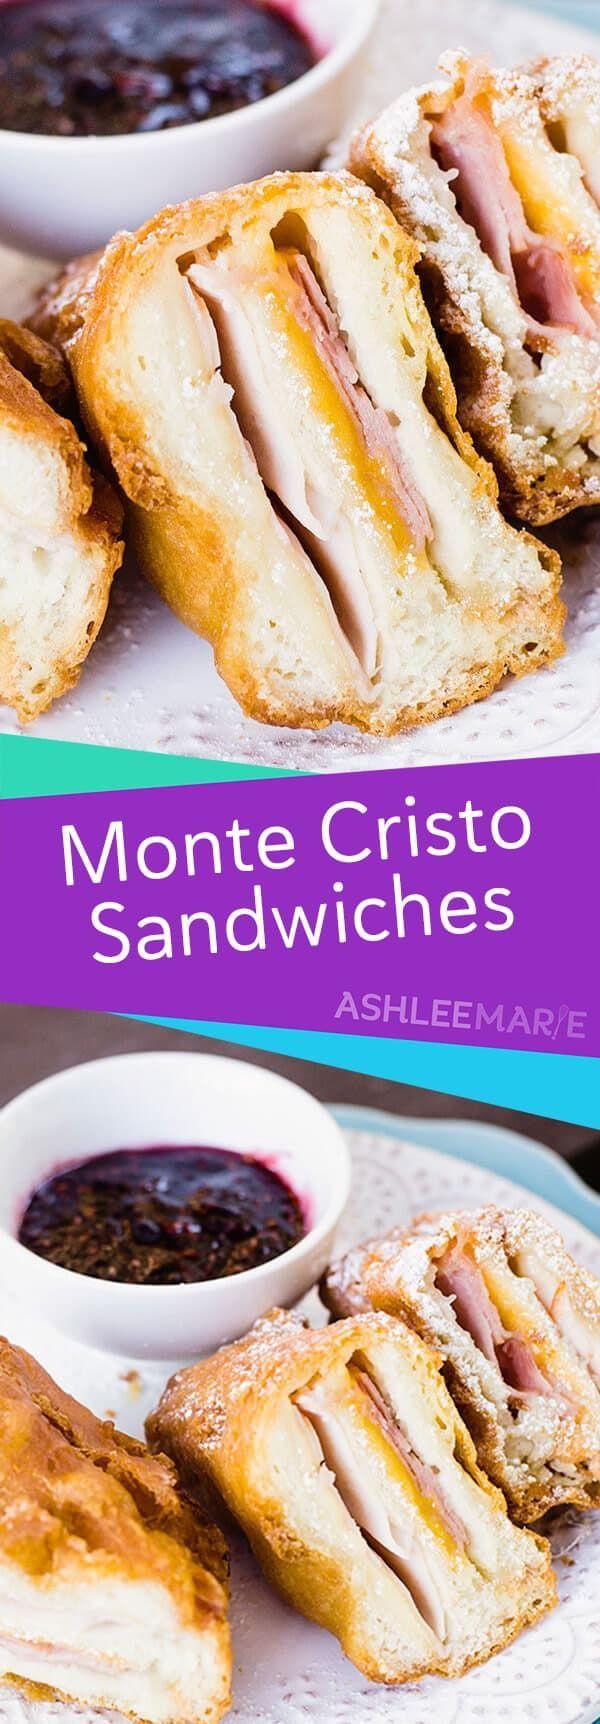 Homemade deep fried monte cristo sandwich - Ashlee Marie